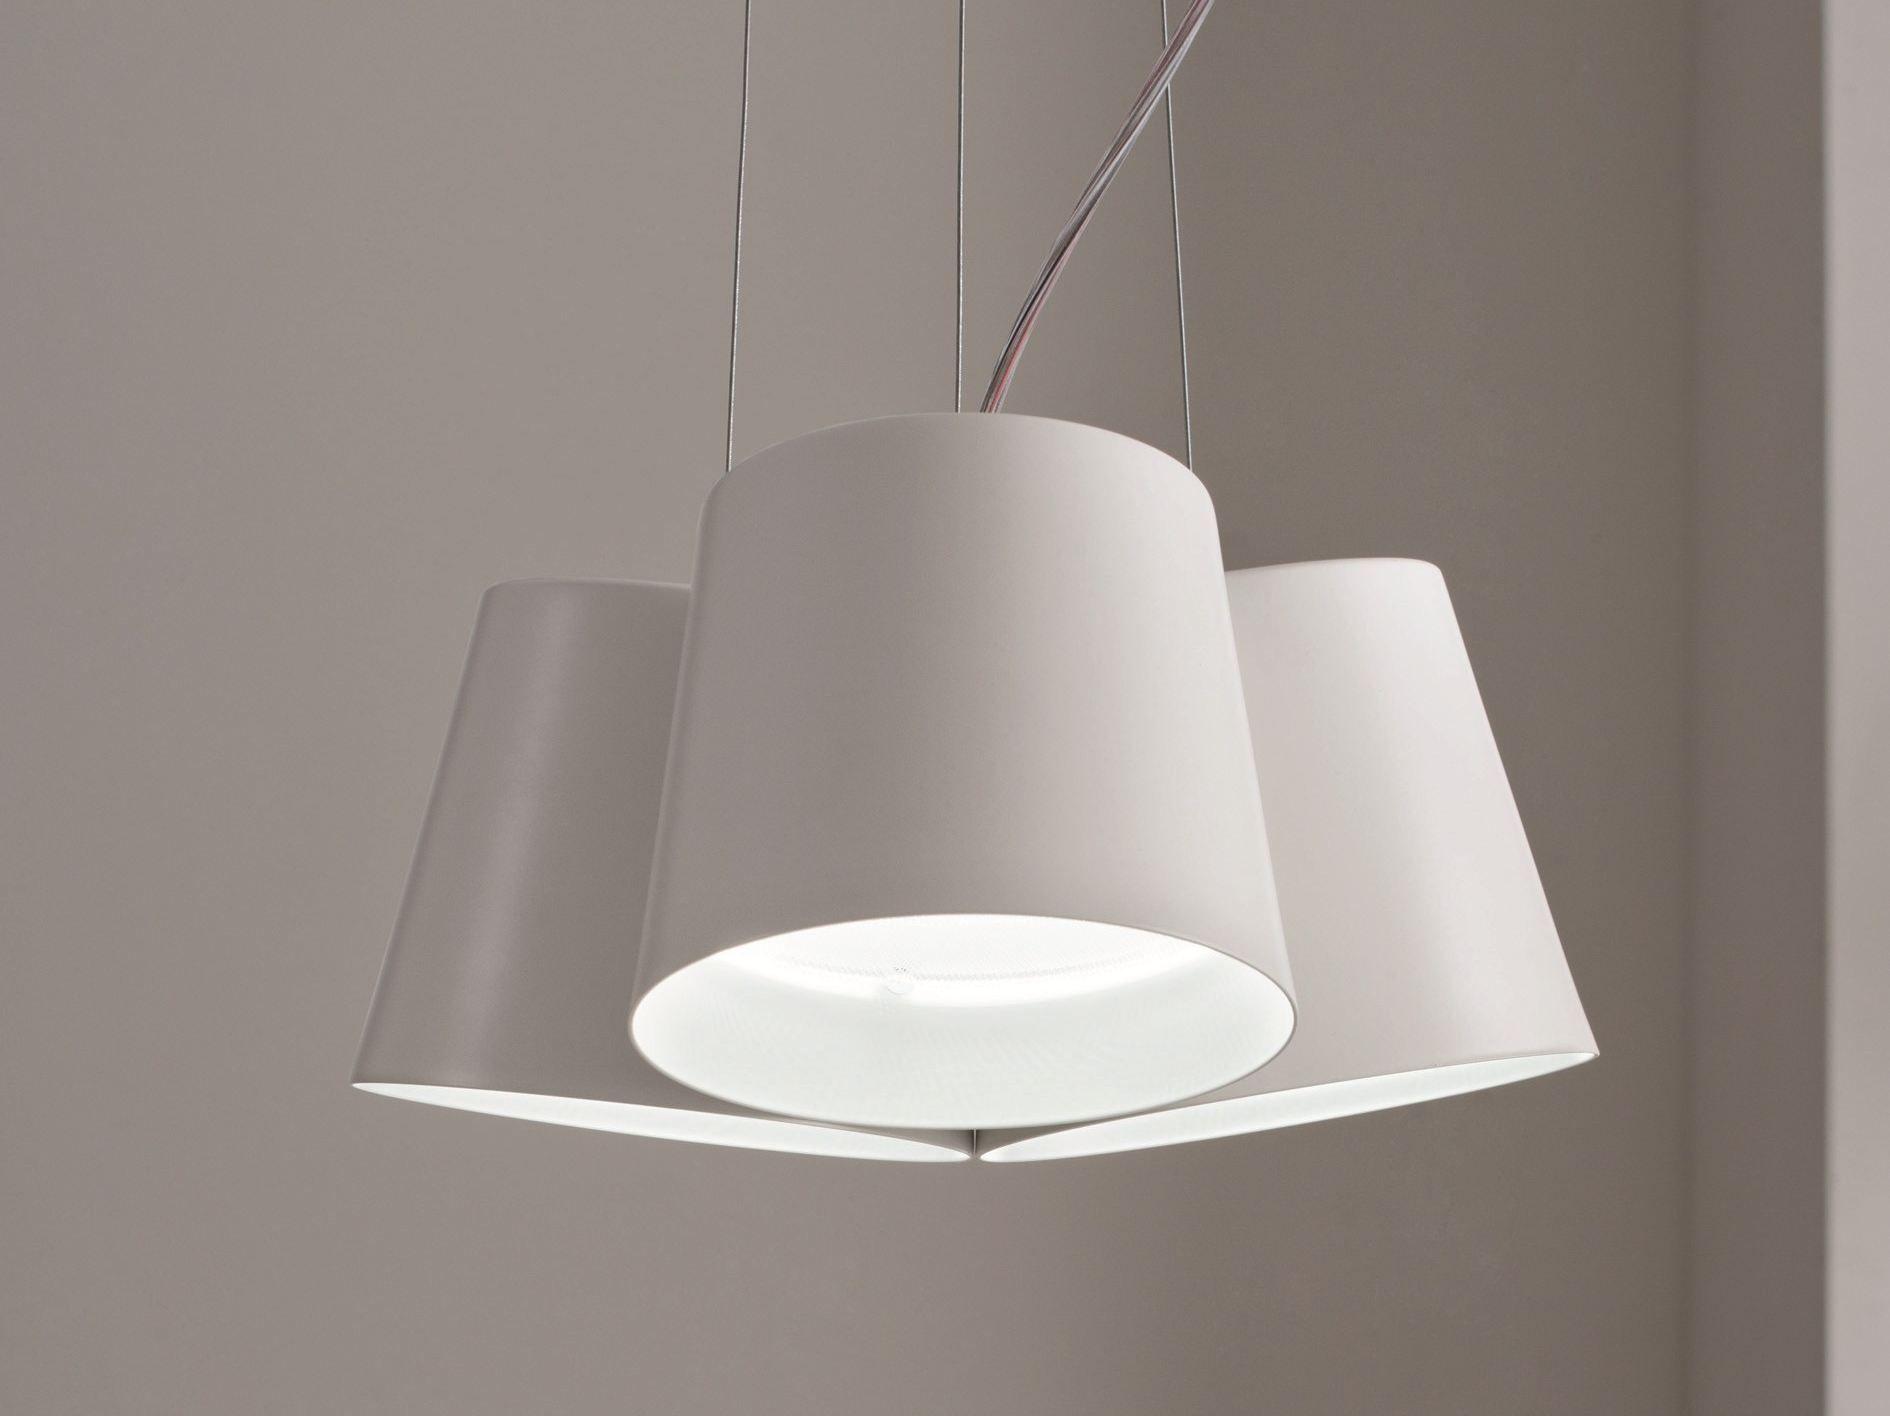 MAI | Pendant lamp By Lucente